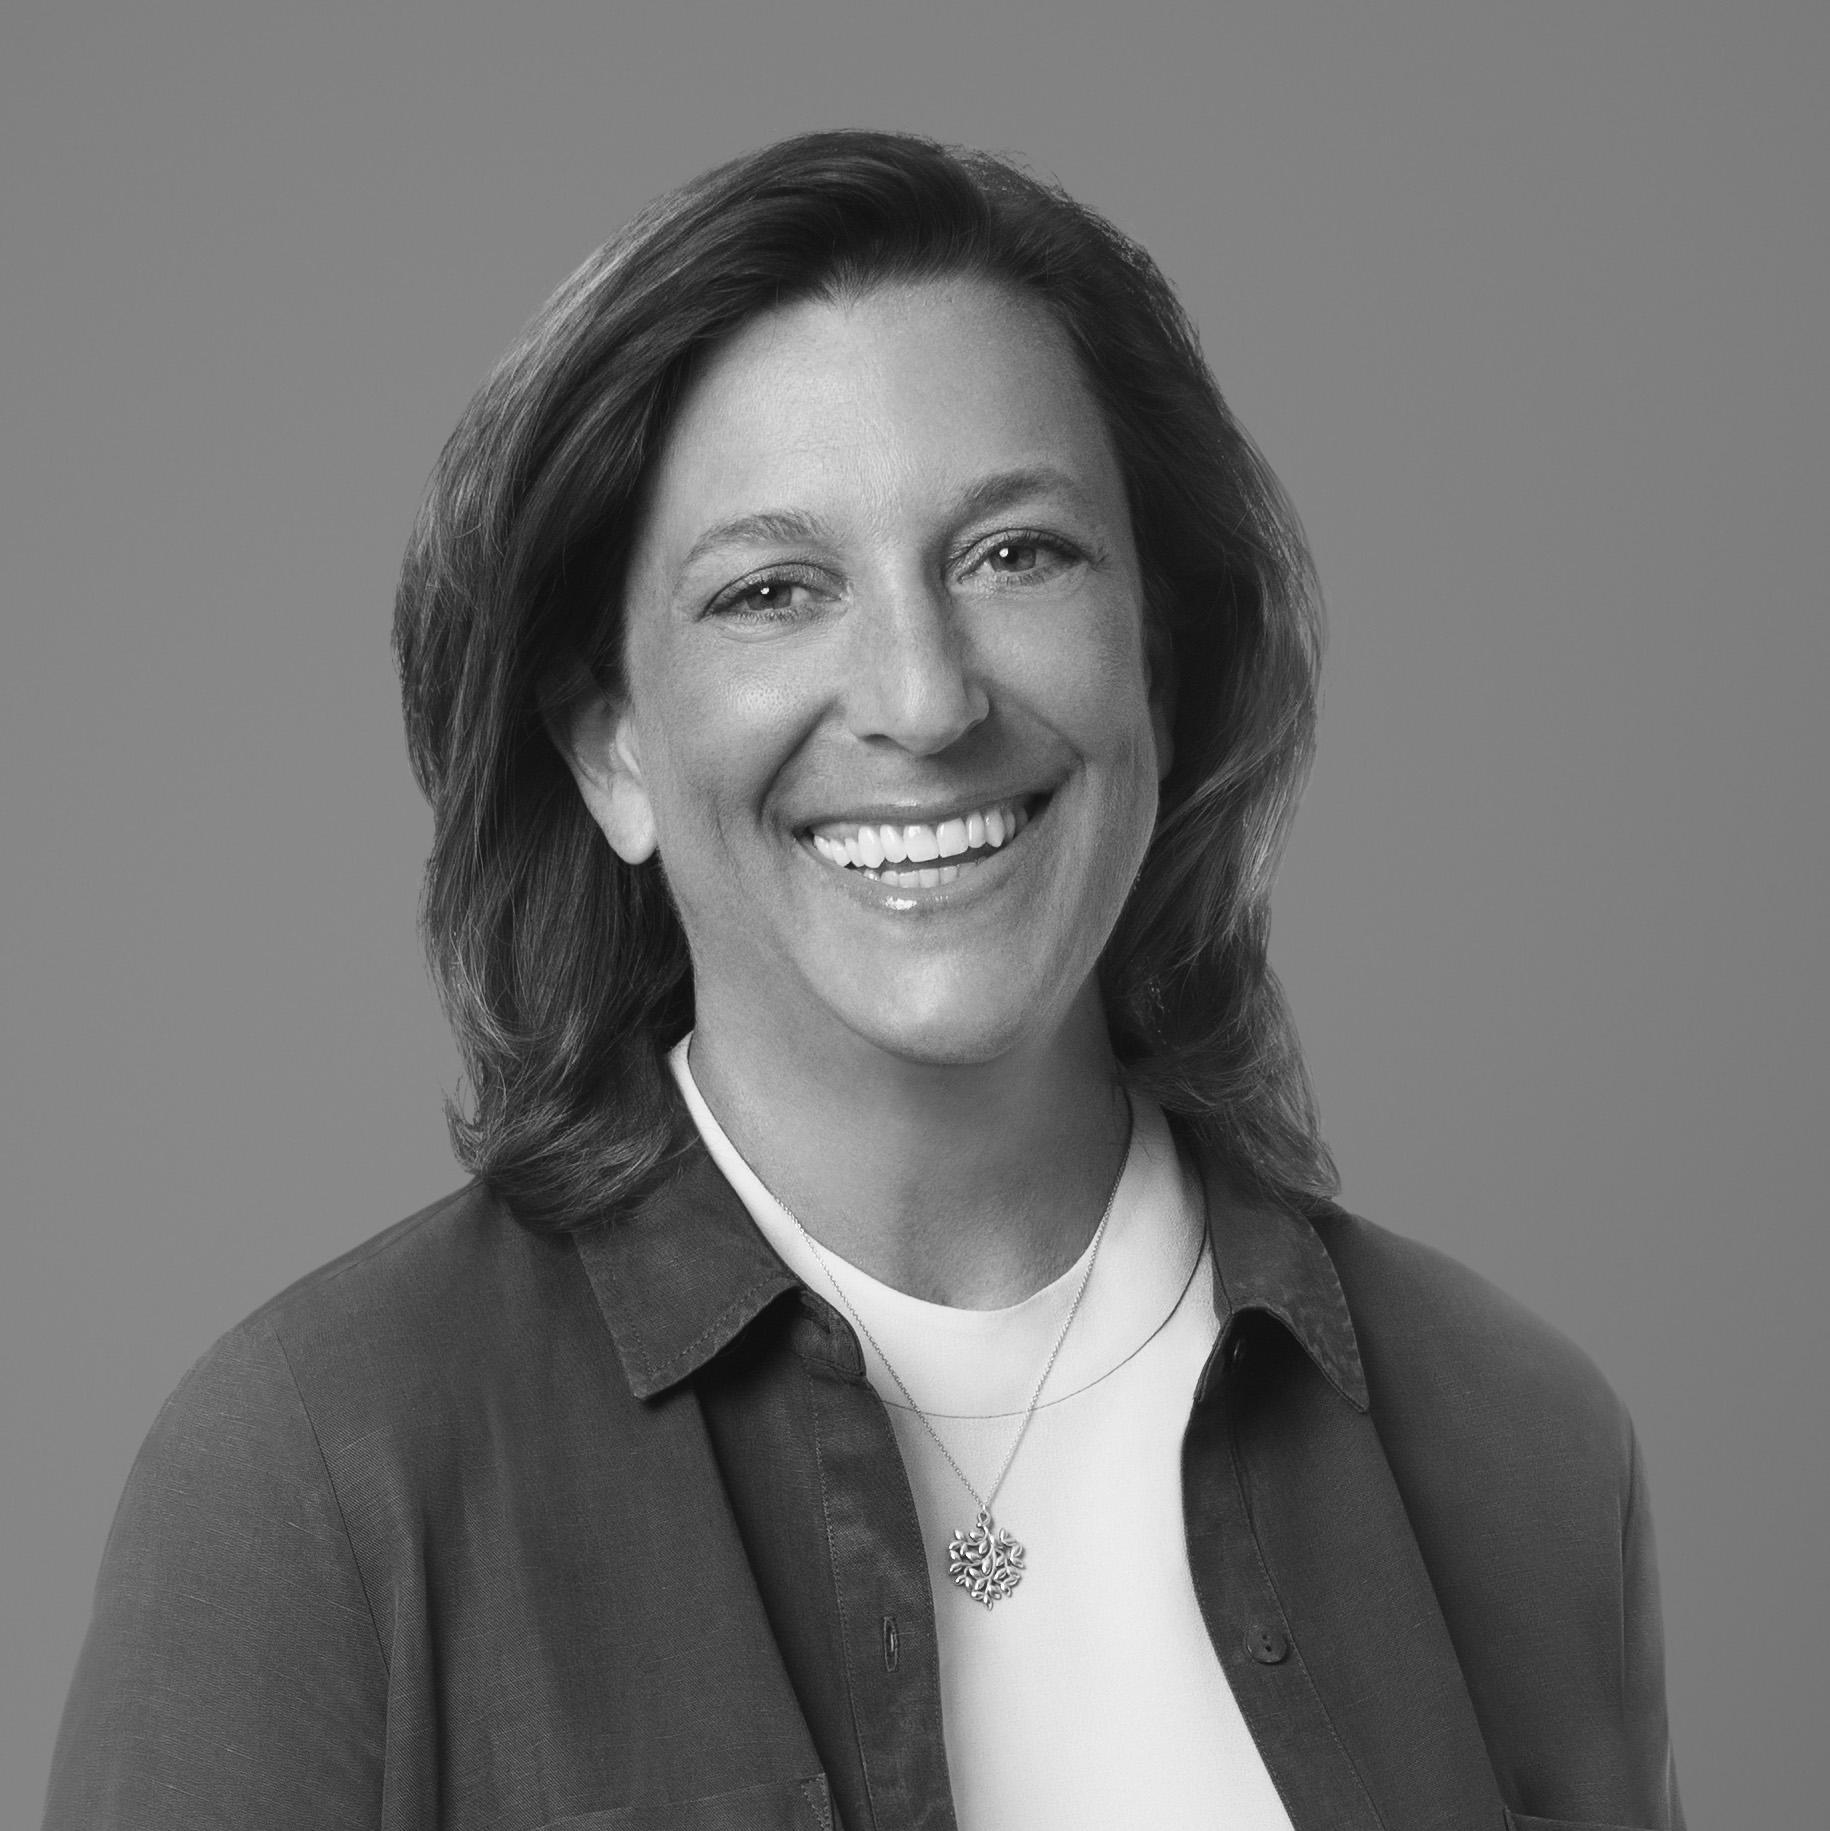 Gloria Loree a speaker at Impact 2020 in Victoria, BC